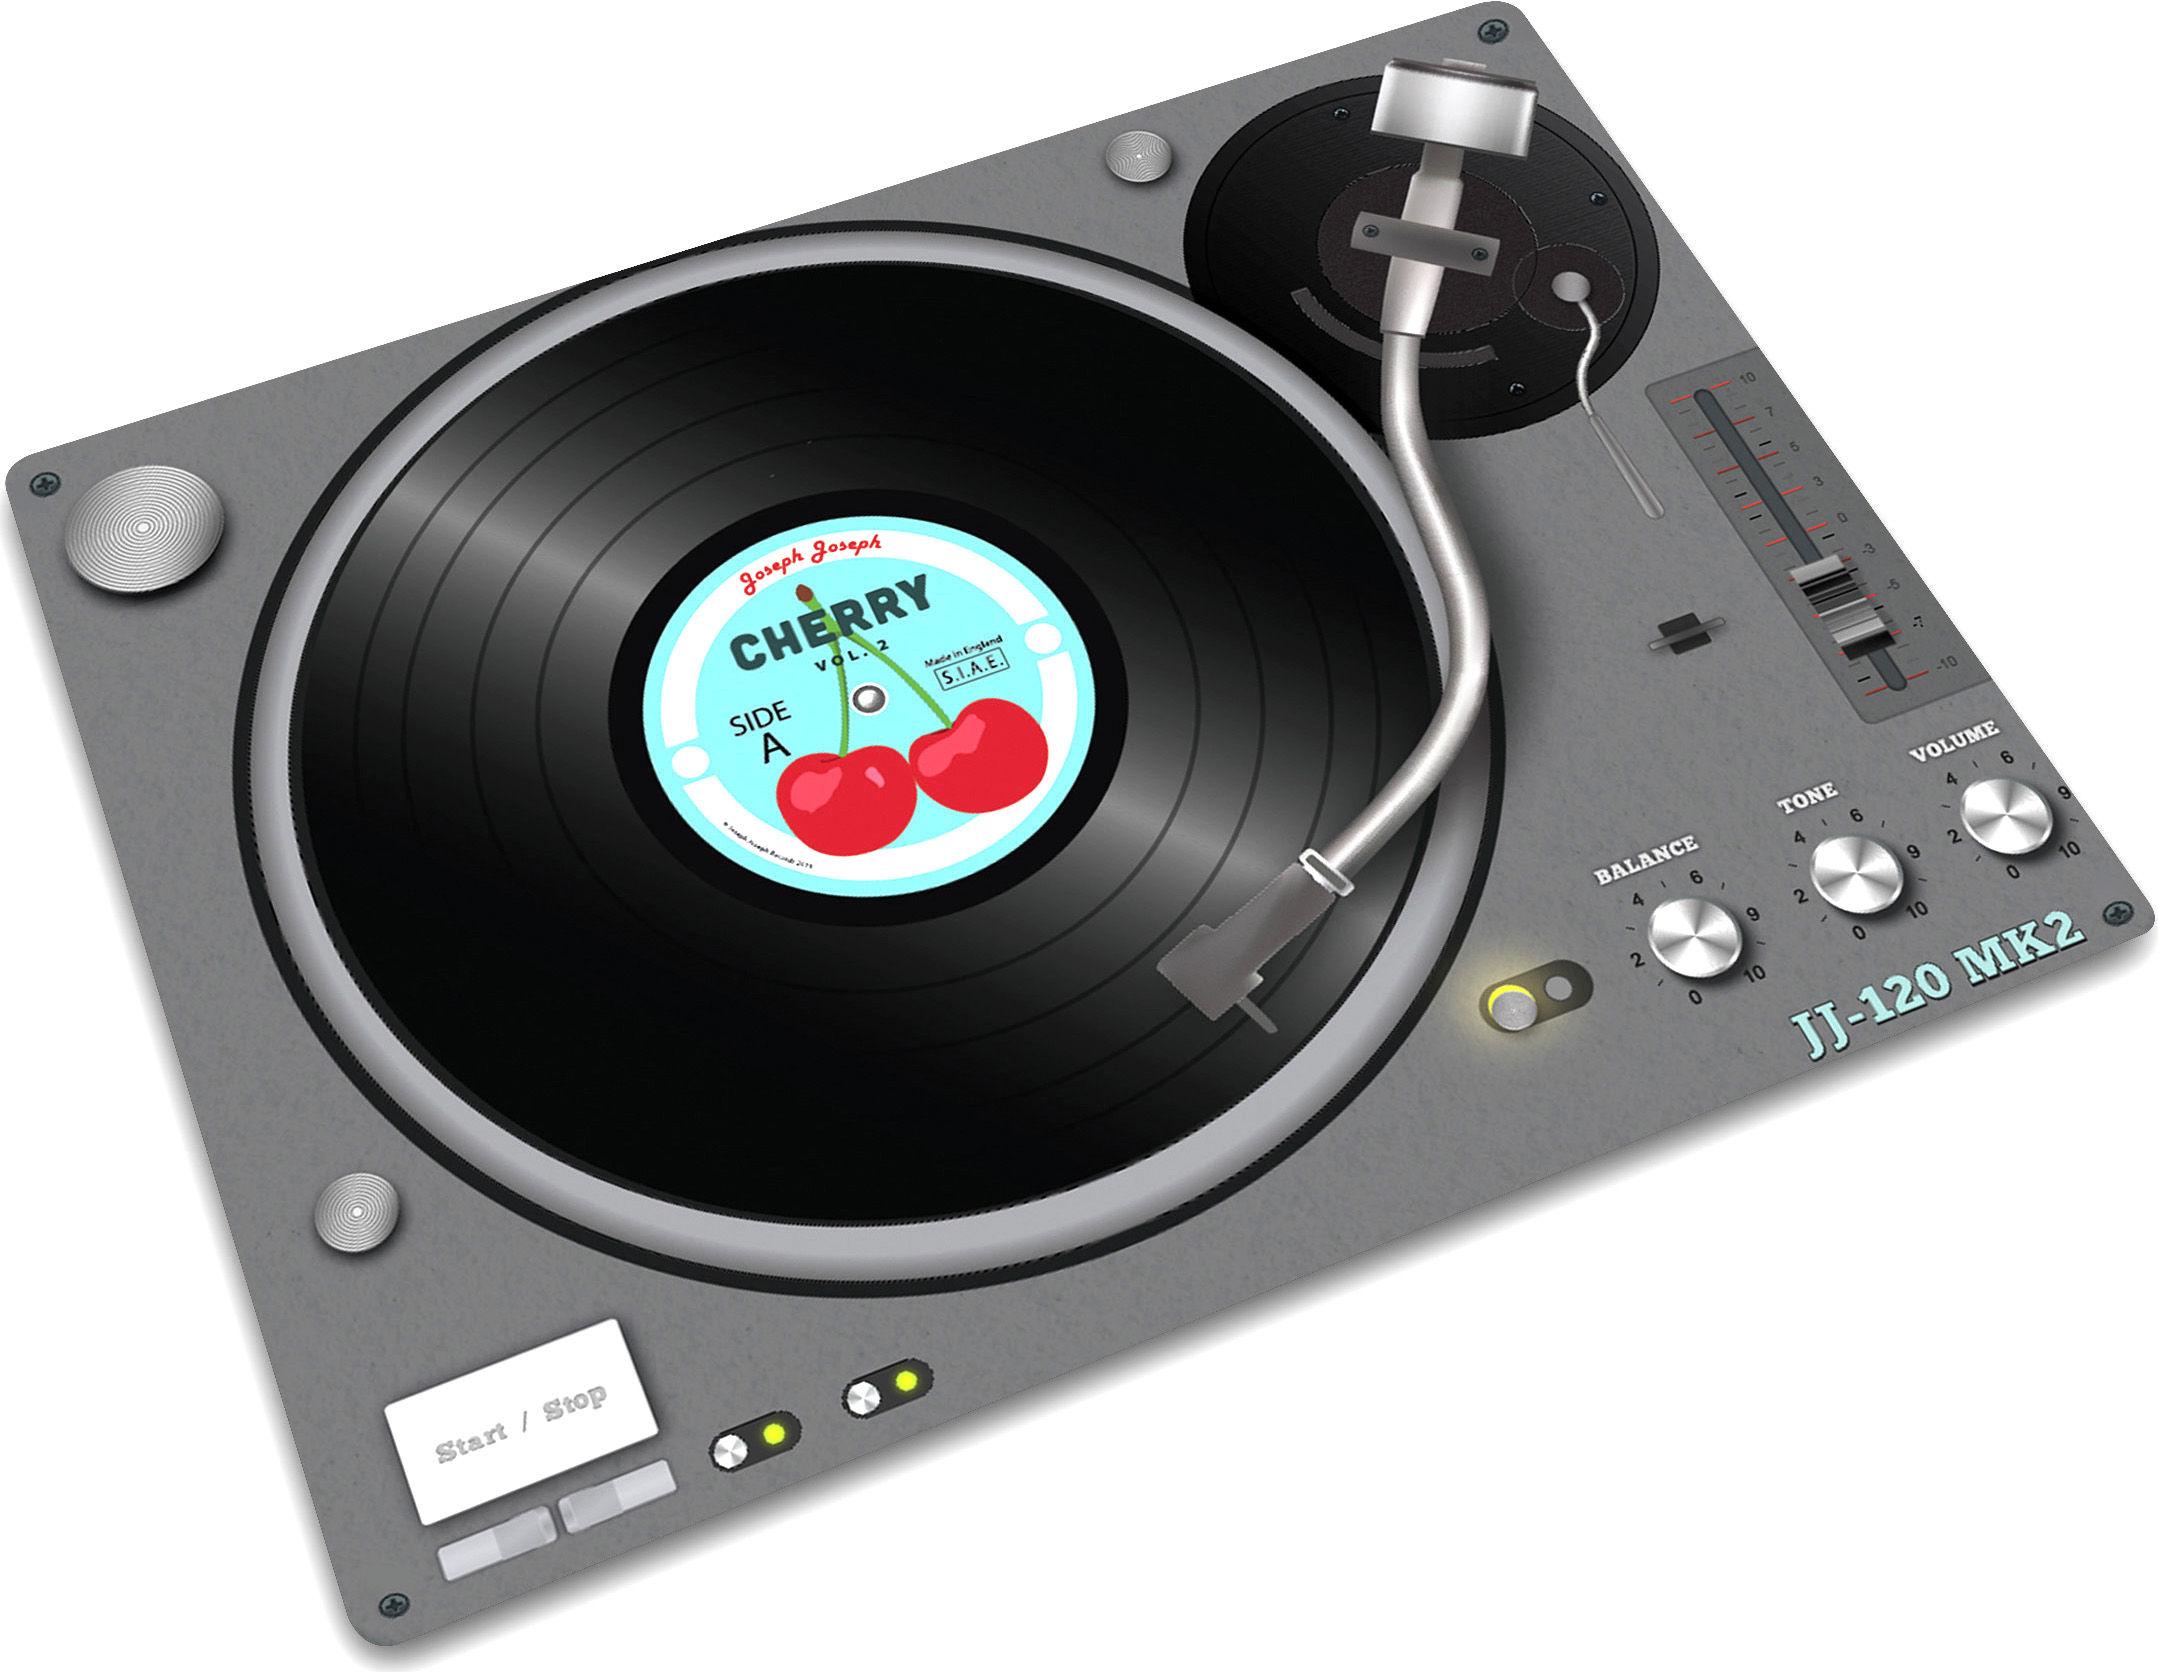 Kitchenware - Cool Kitchen Gadgets - Record player Chopping board - Trivet / Rectangular presentation tray by Joseph Joseph - Record player - Glass, Rubber